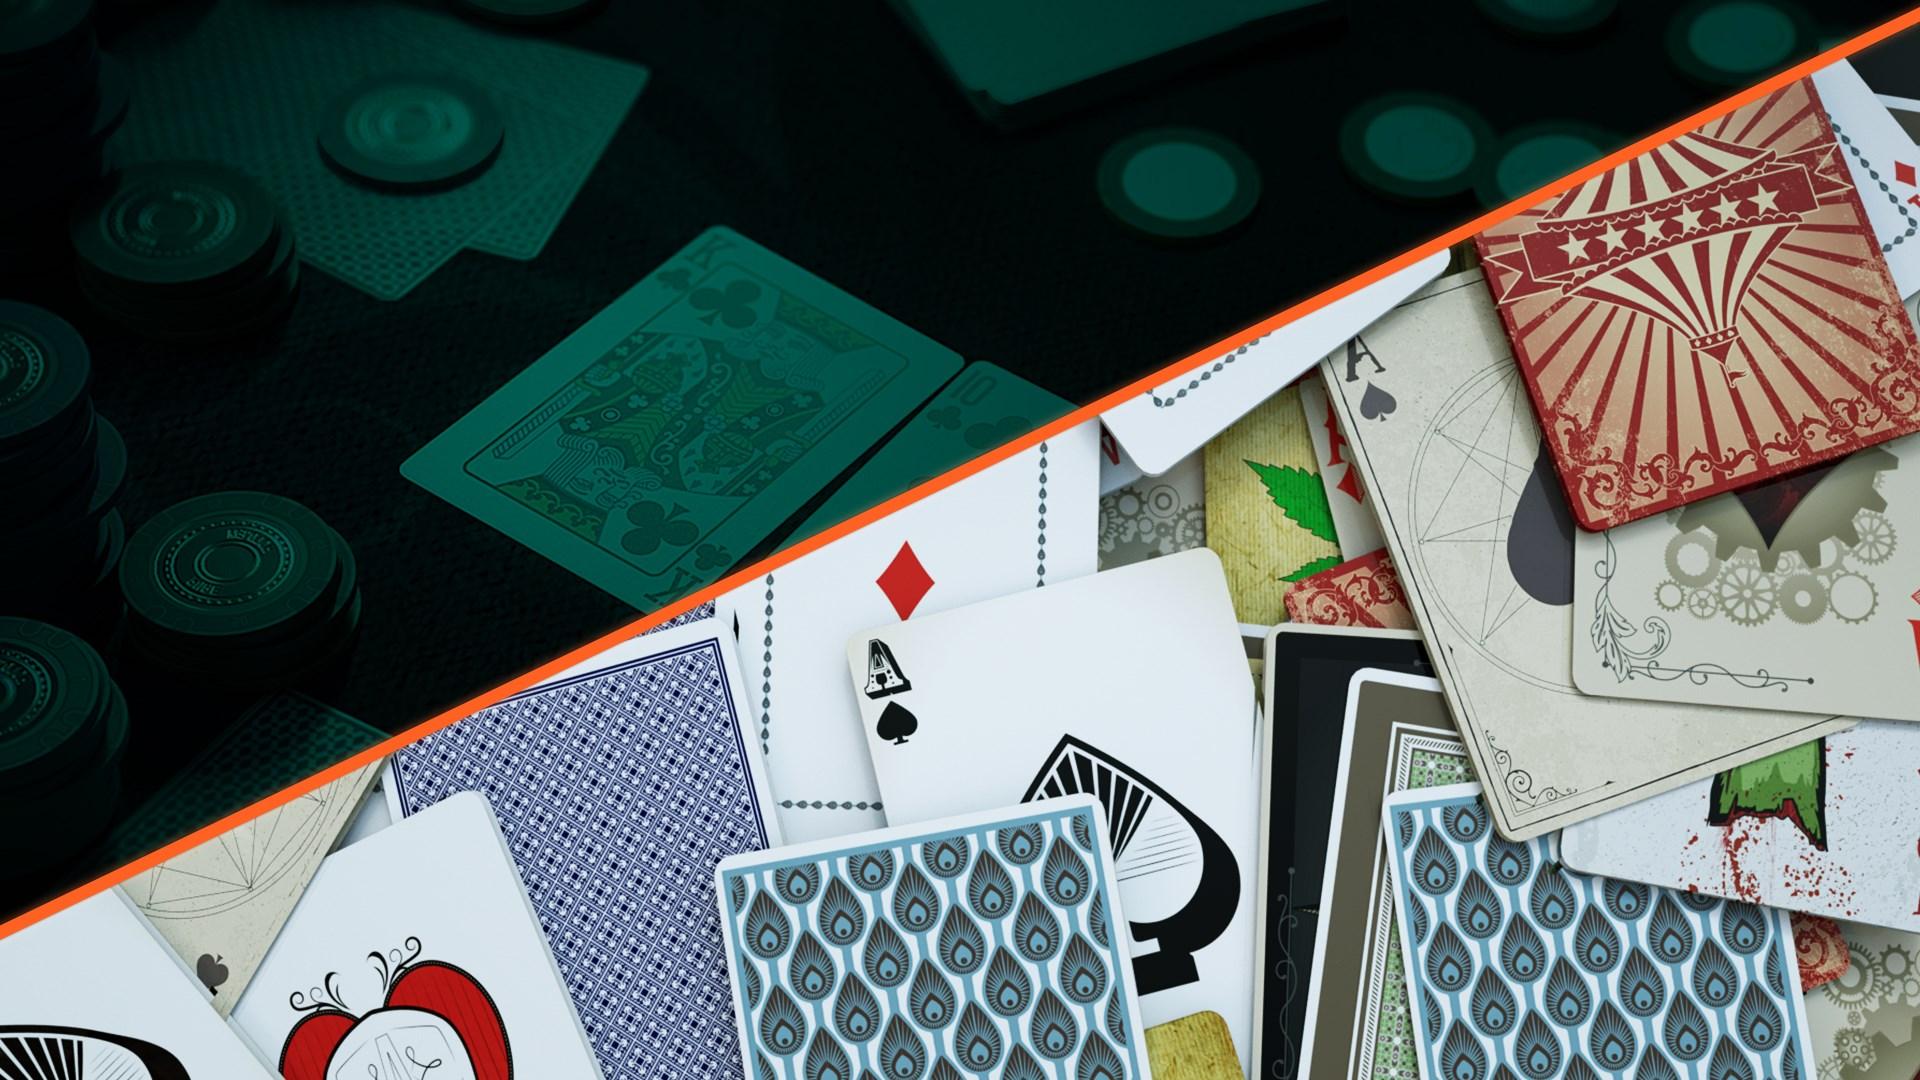 Pure Hold'em: Full House Poker Bundle